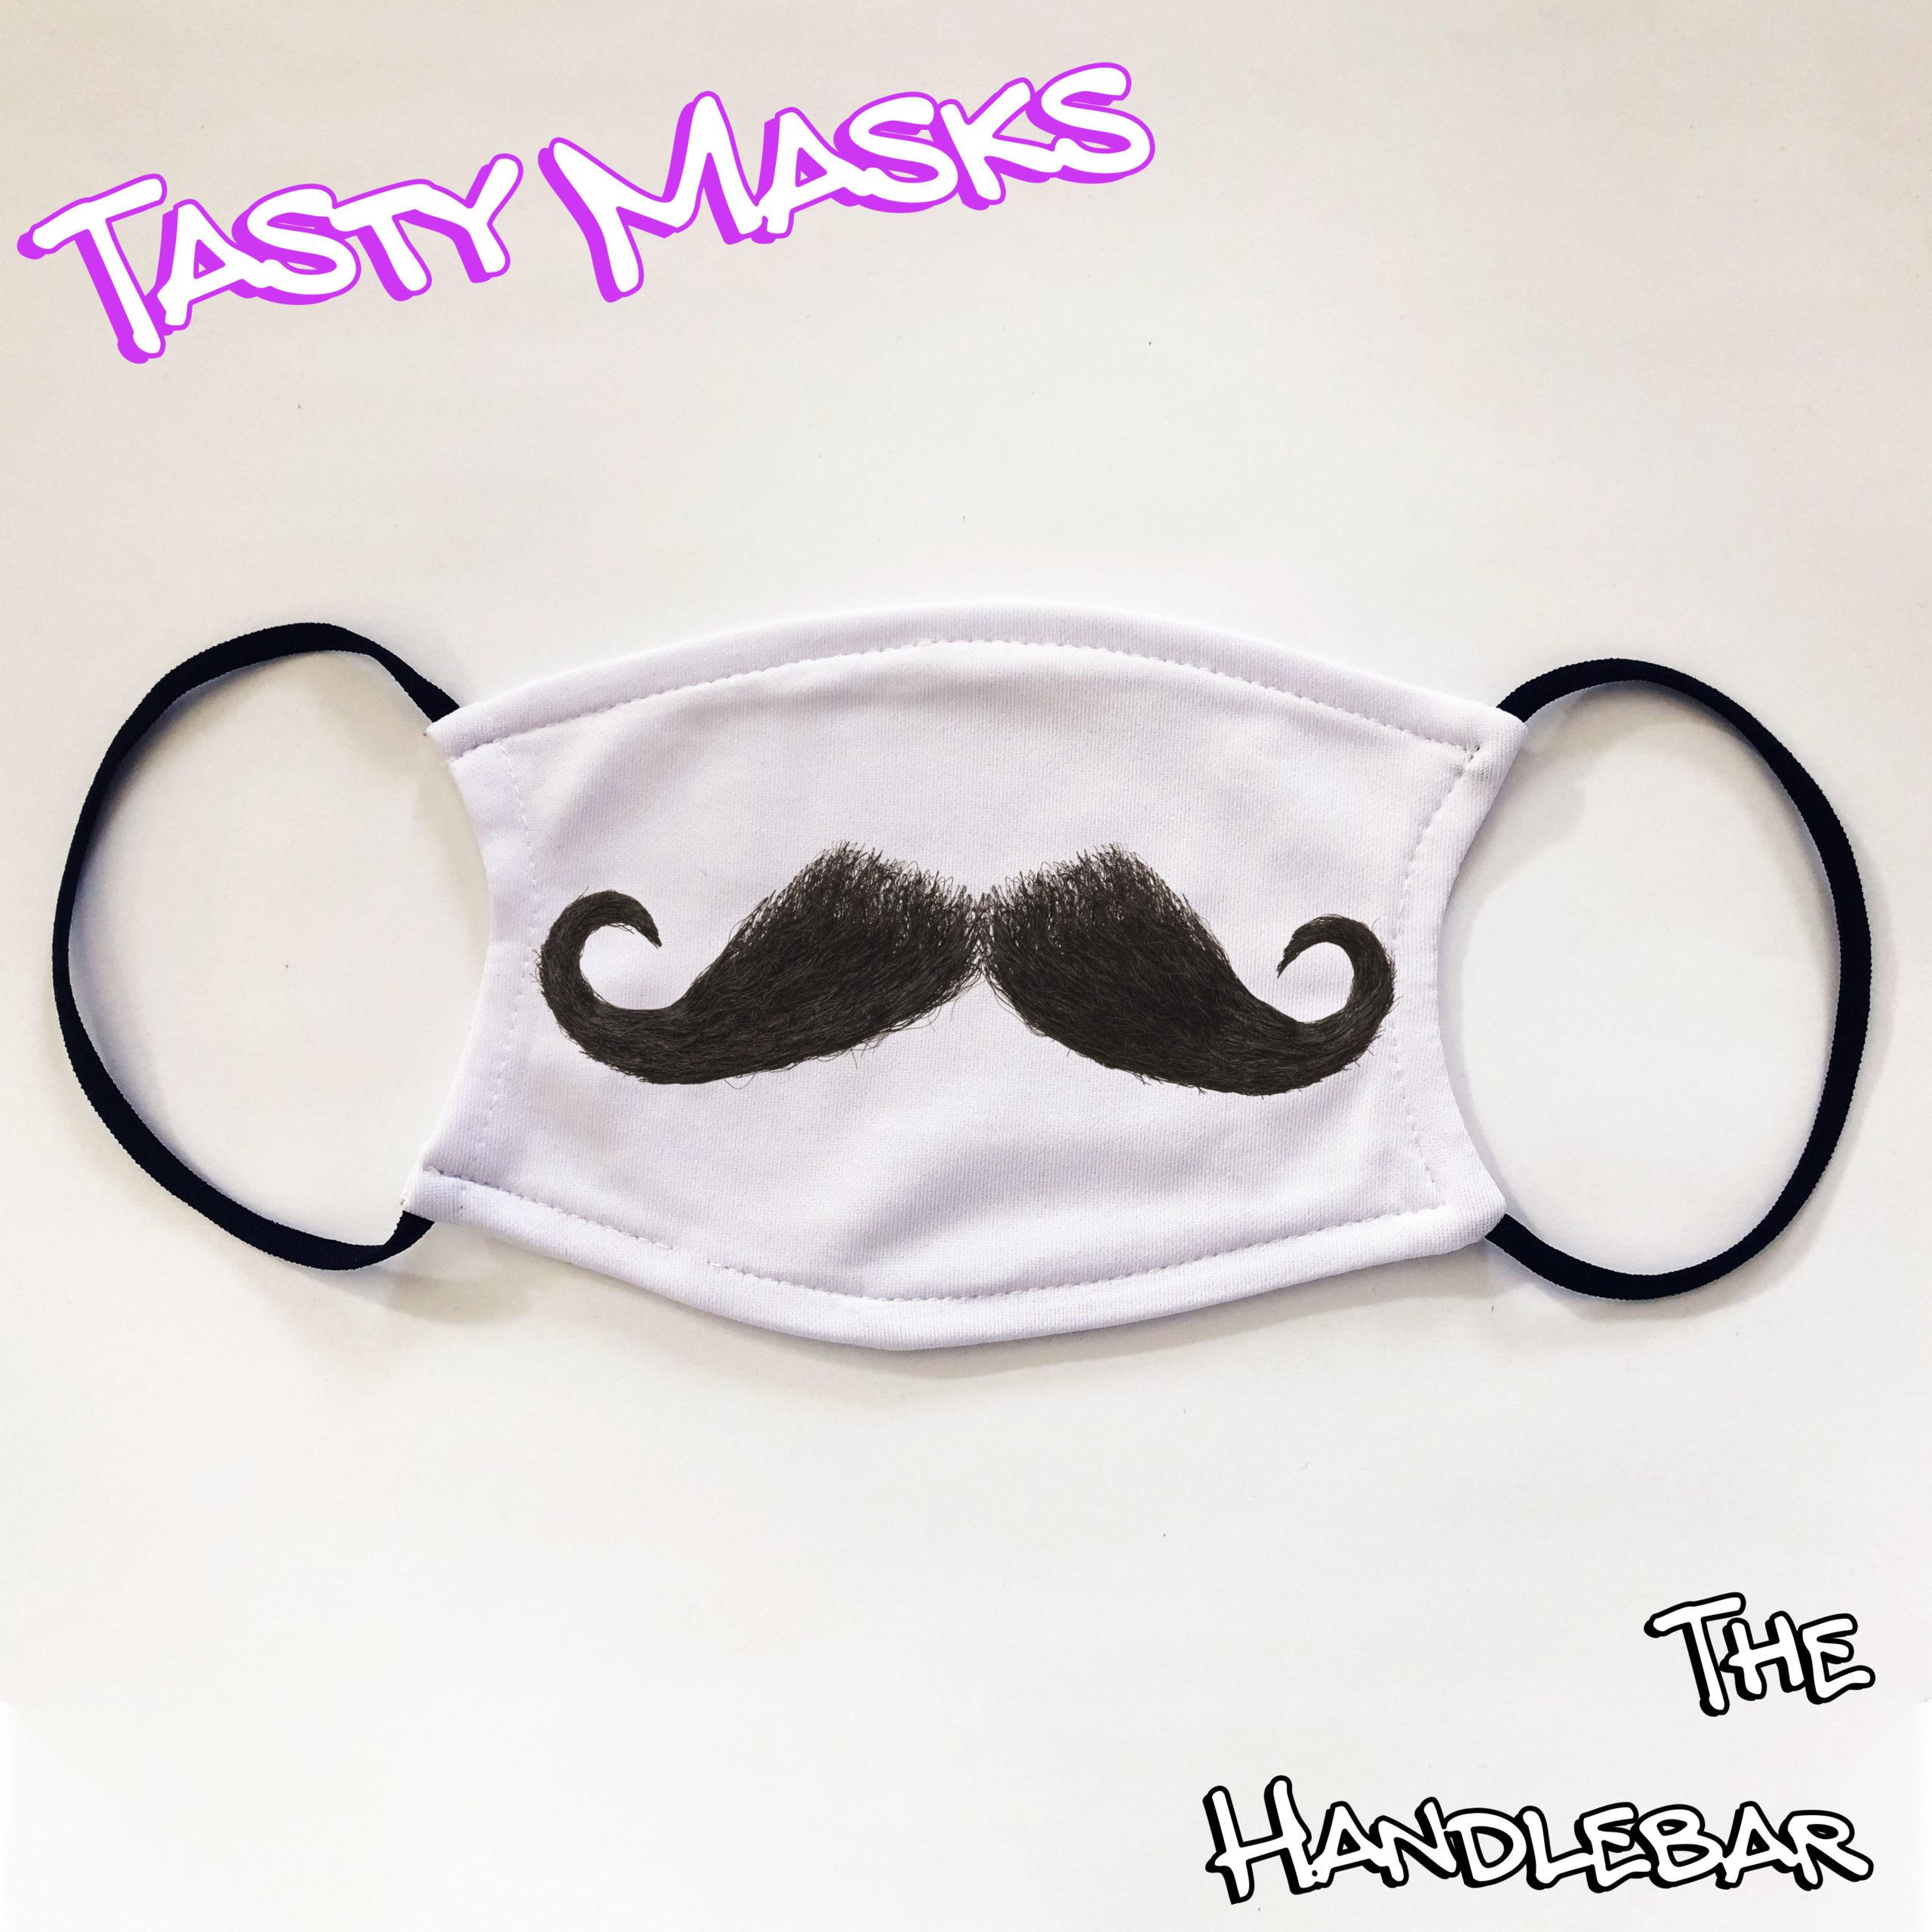 White facemask with black handlebar moustache design